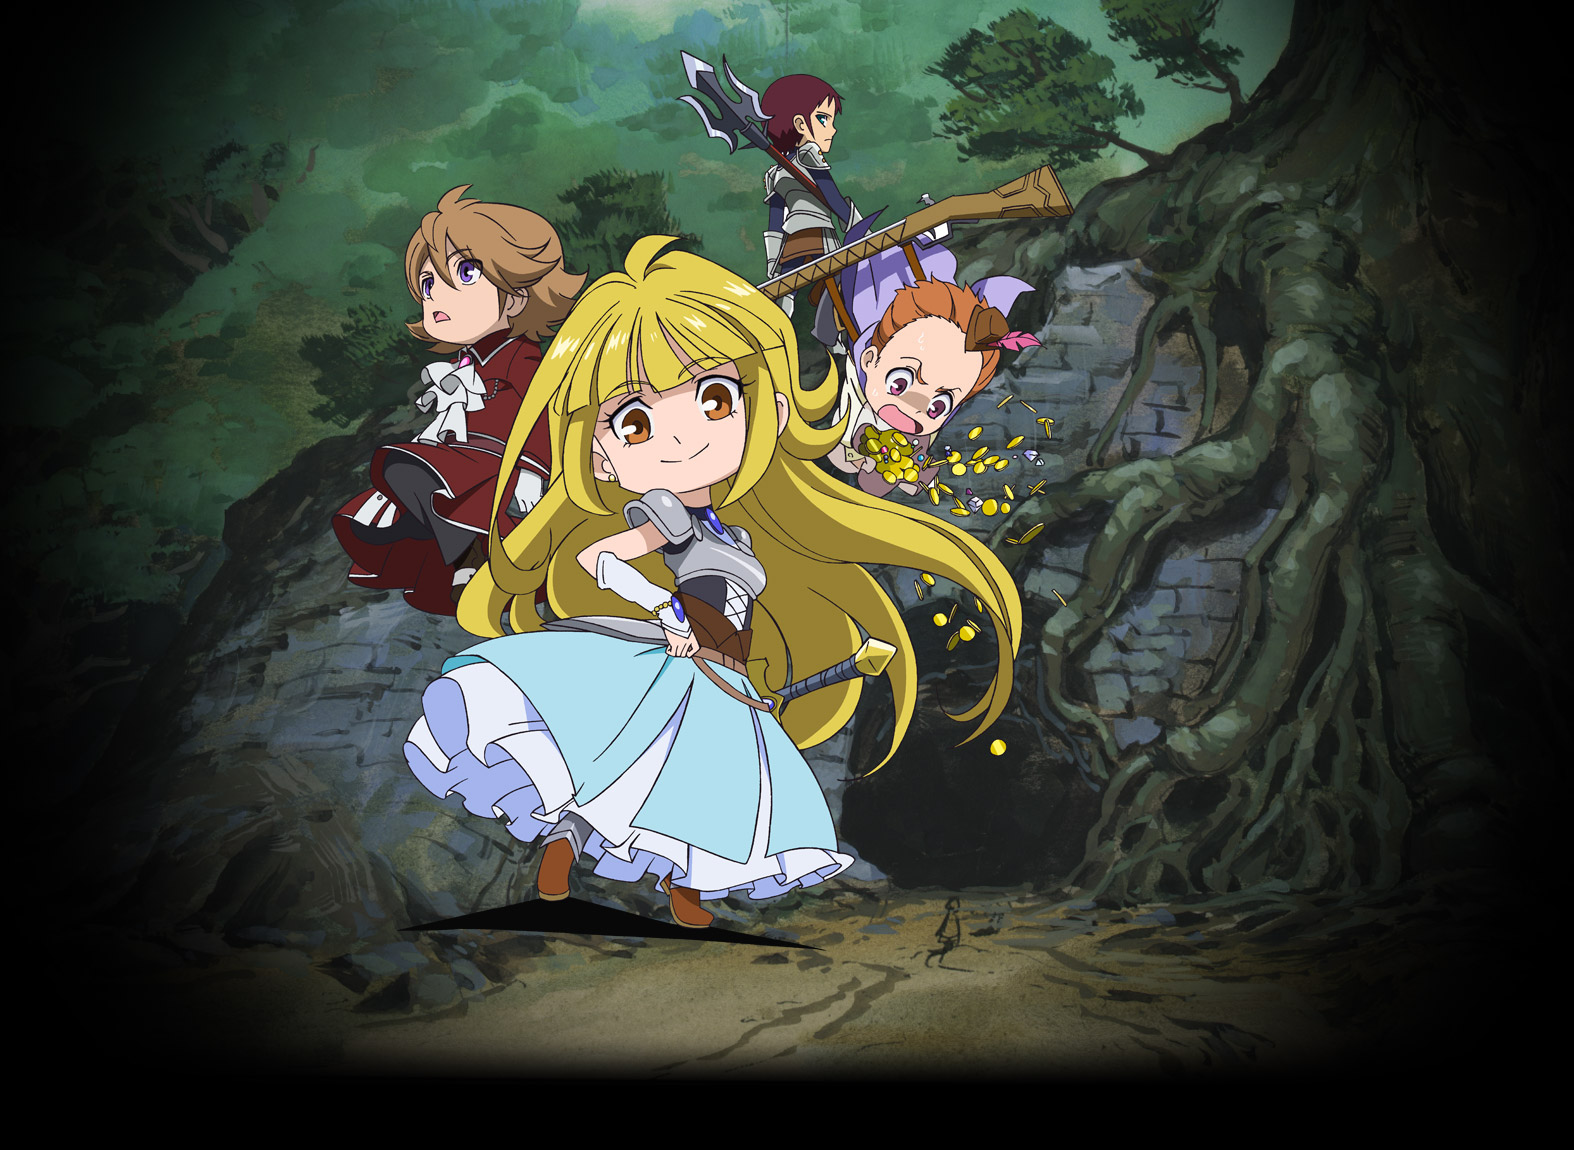 Visuel de l'anime Tanken Driland